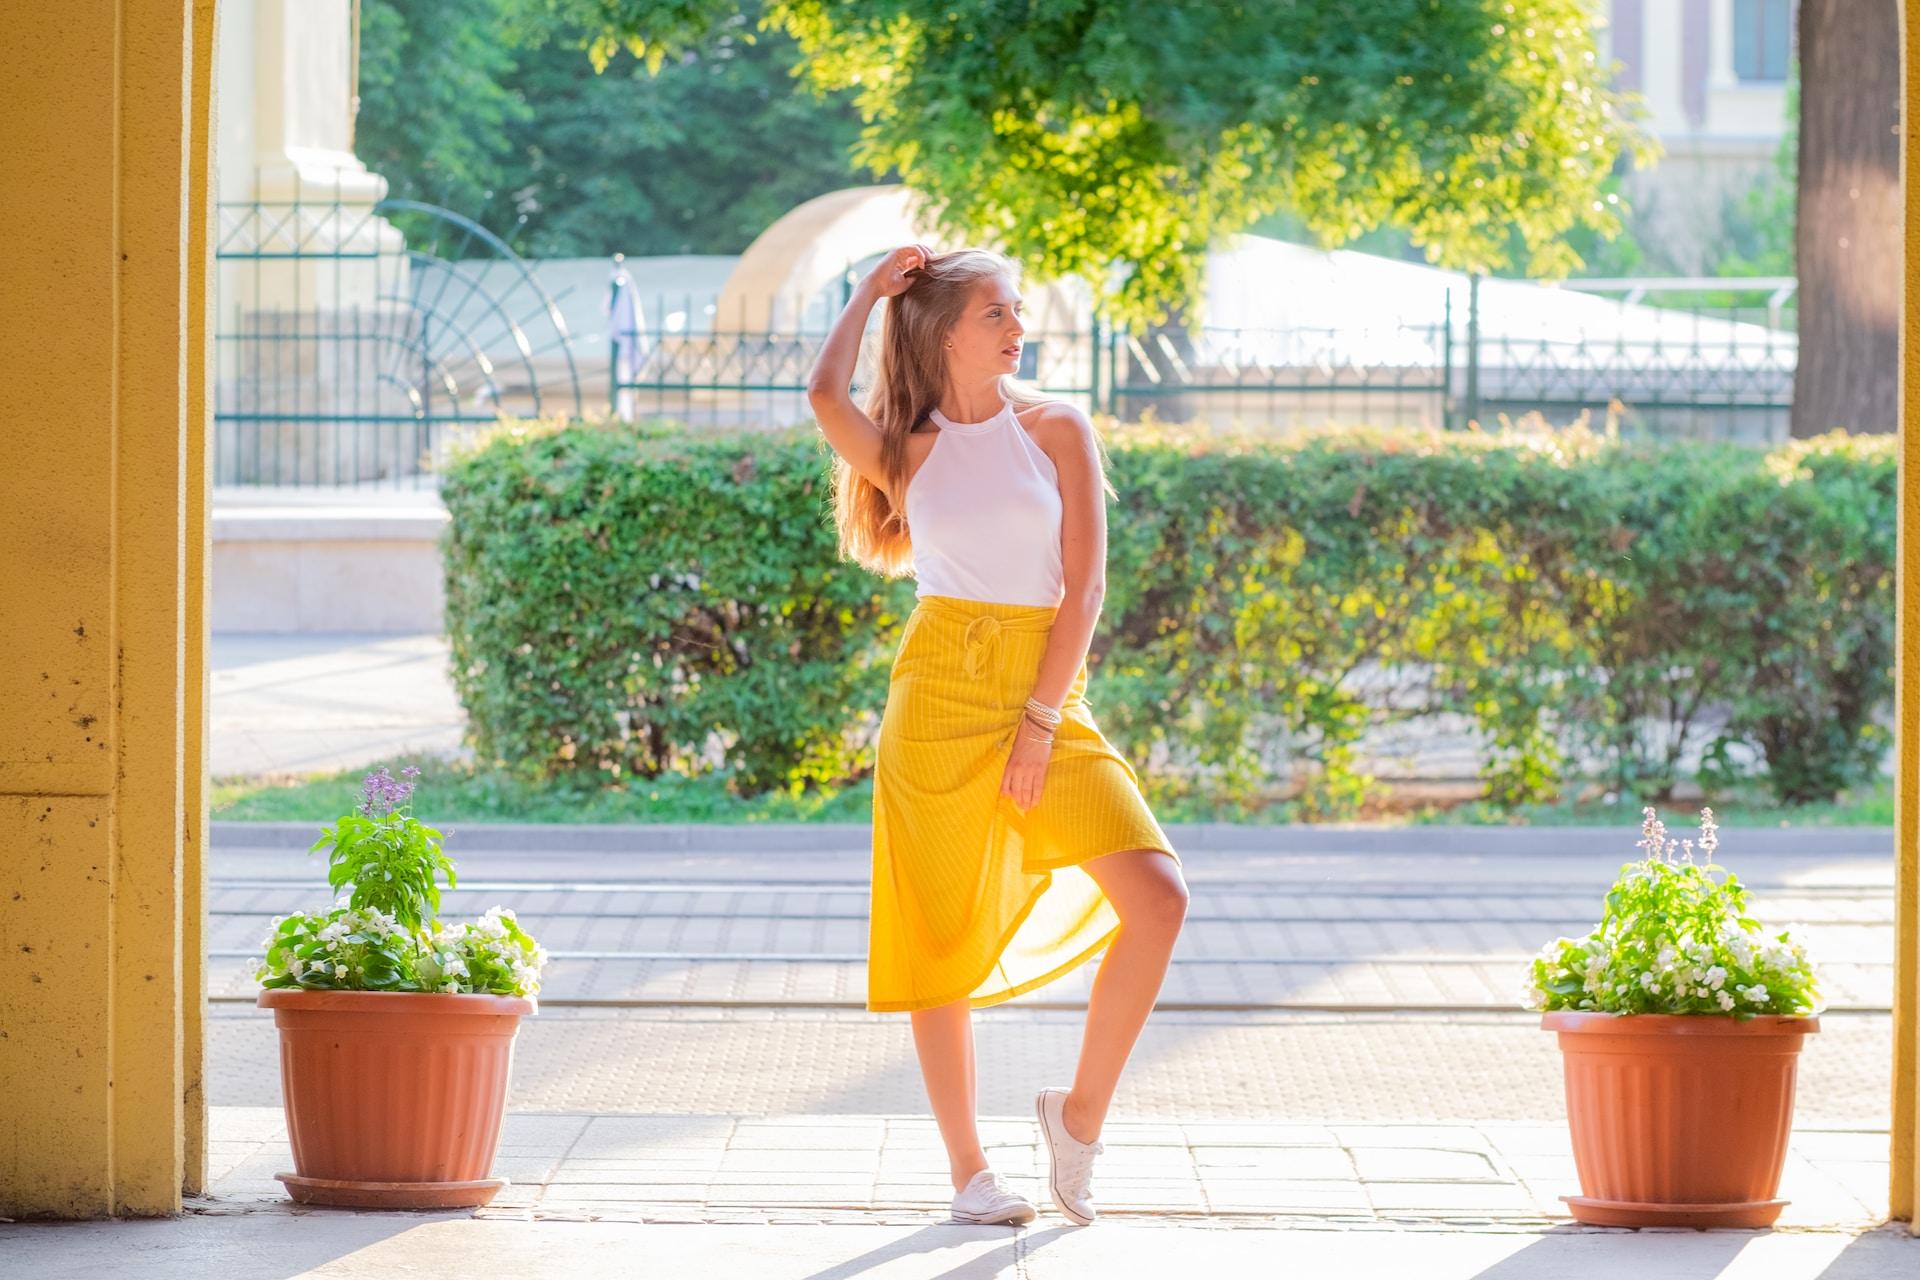 woman posing near plants